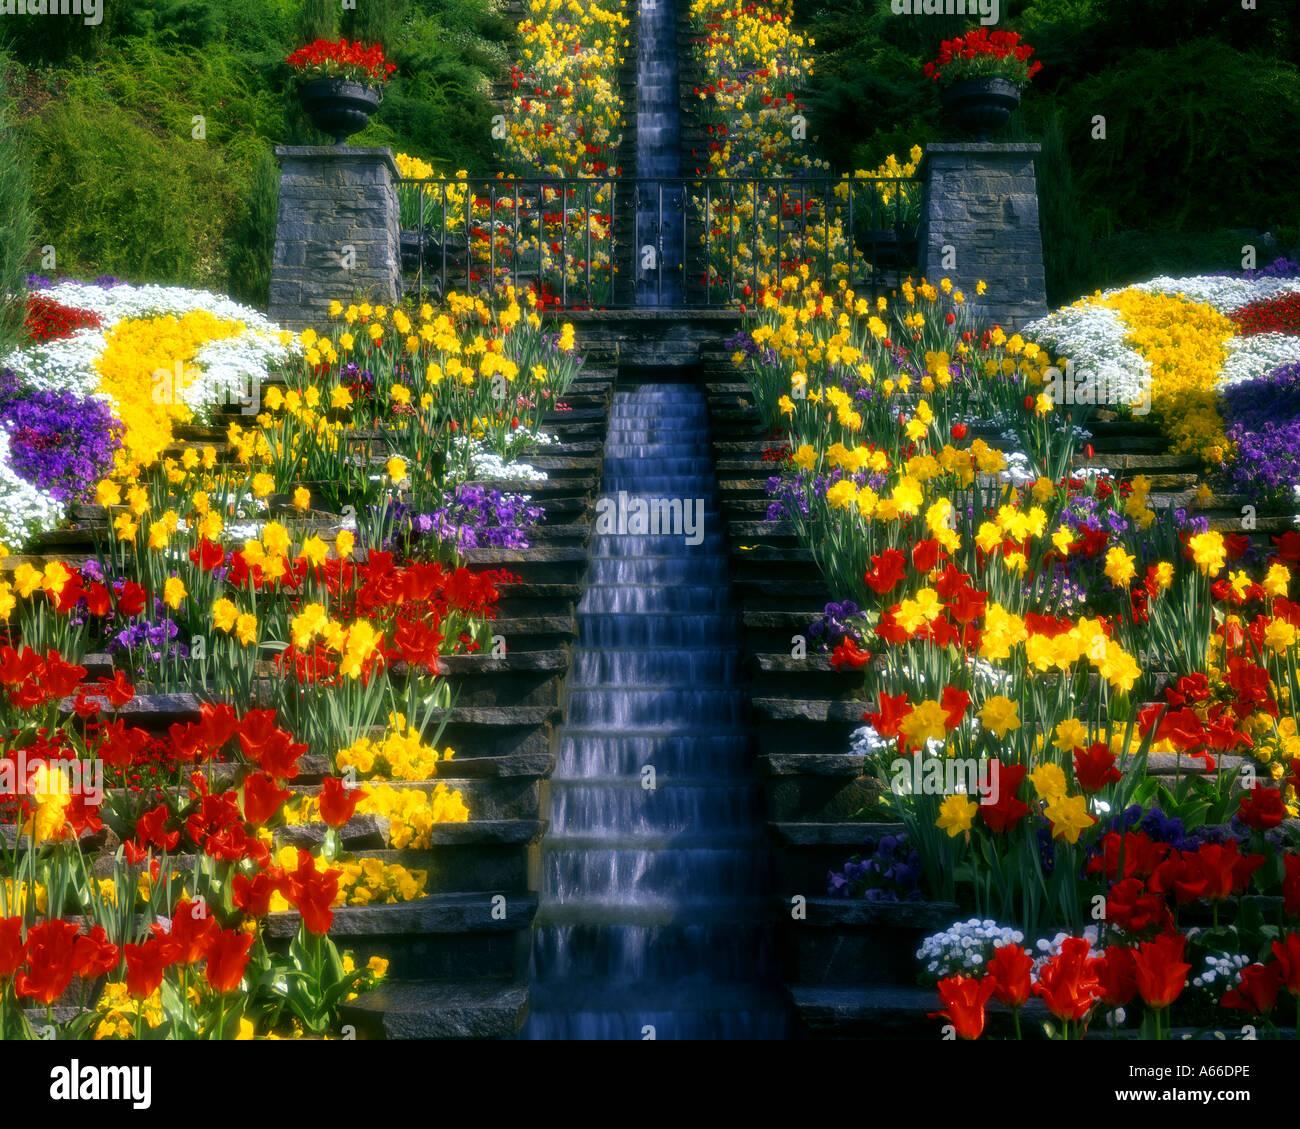 DE - BADEN-WUERTTEMBERG:  Gardens at Mainau Island - Stock Image